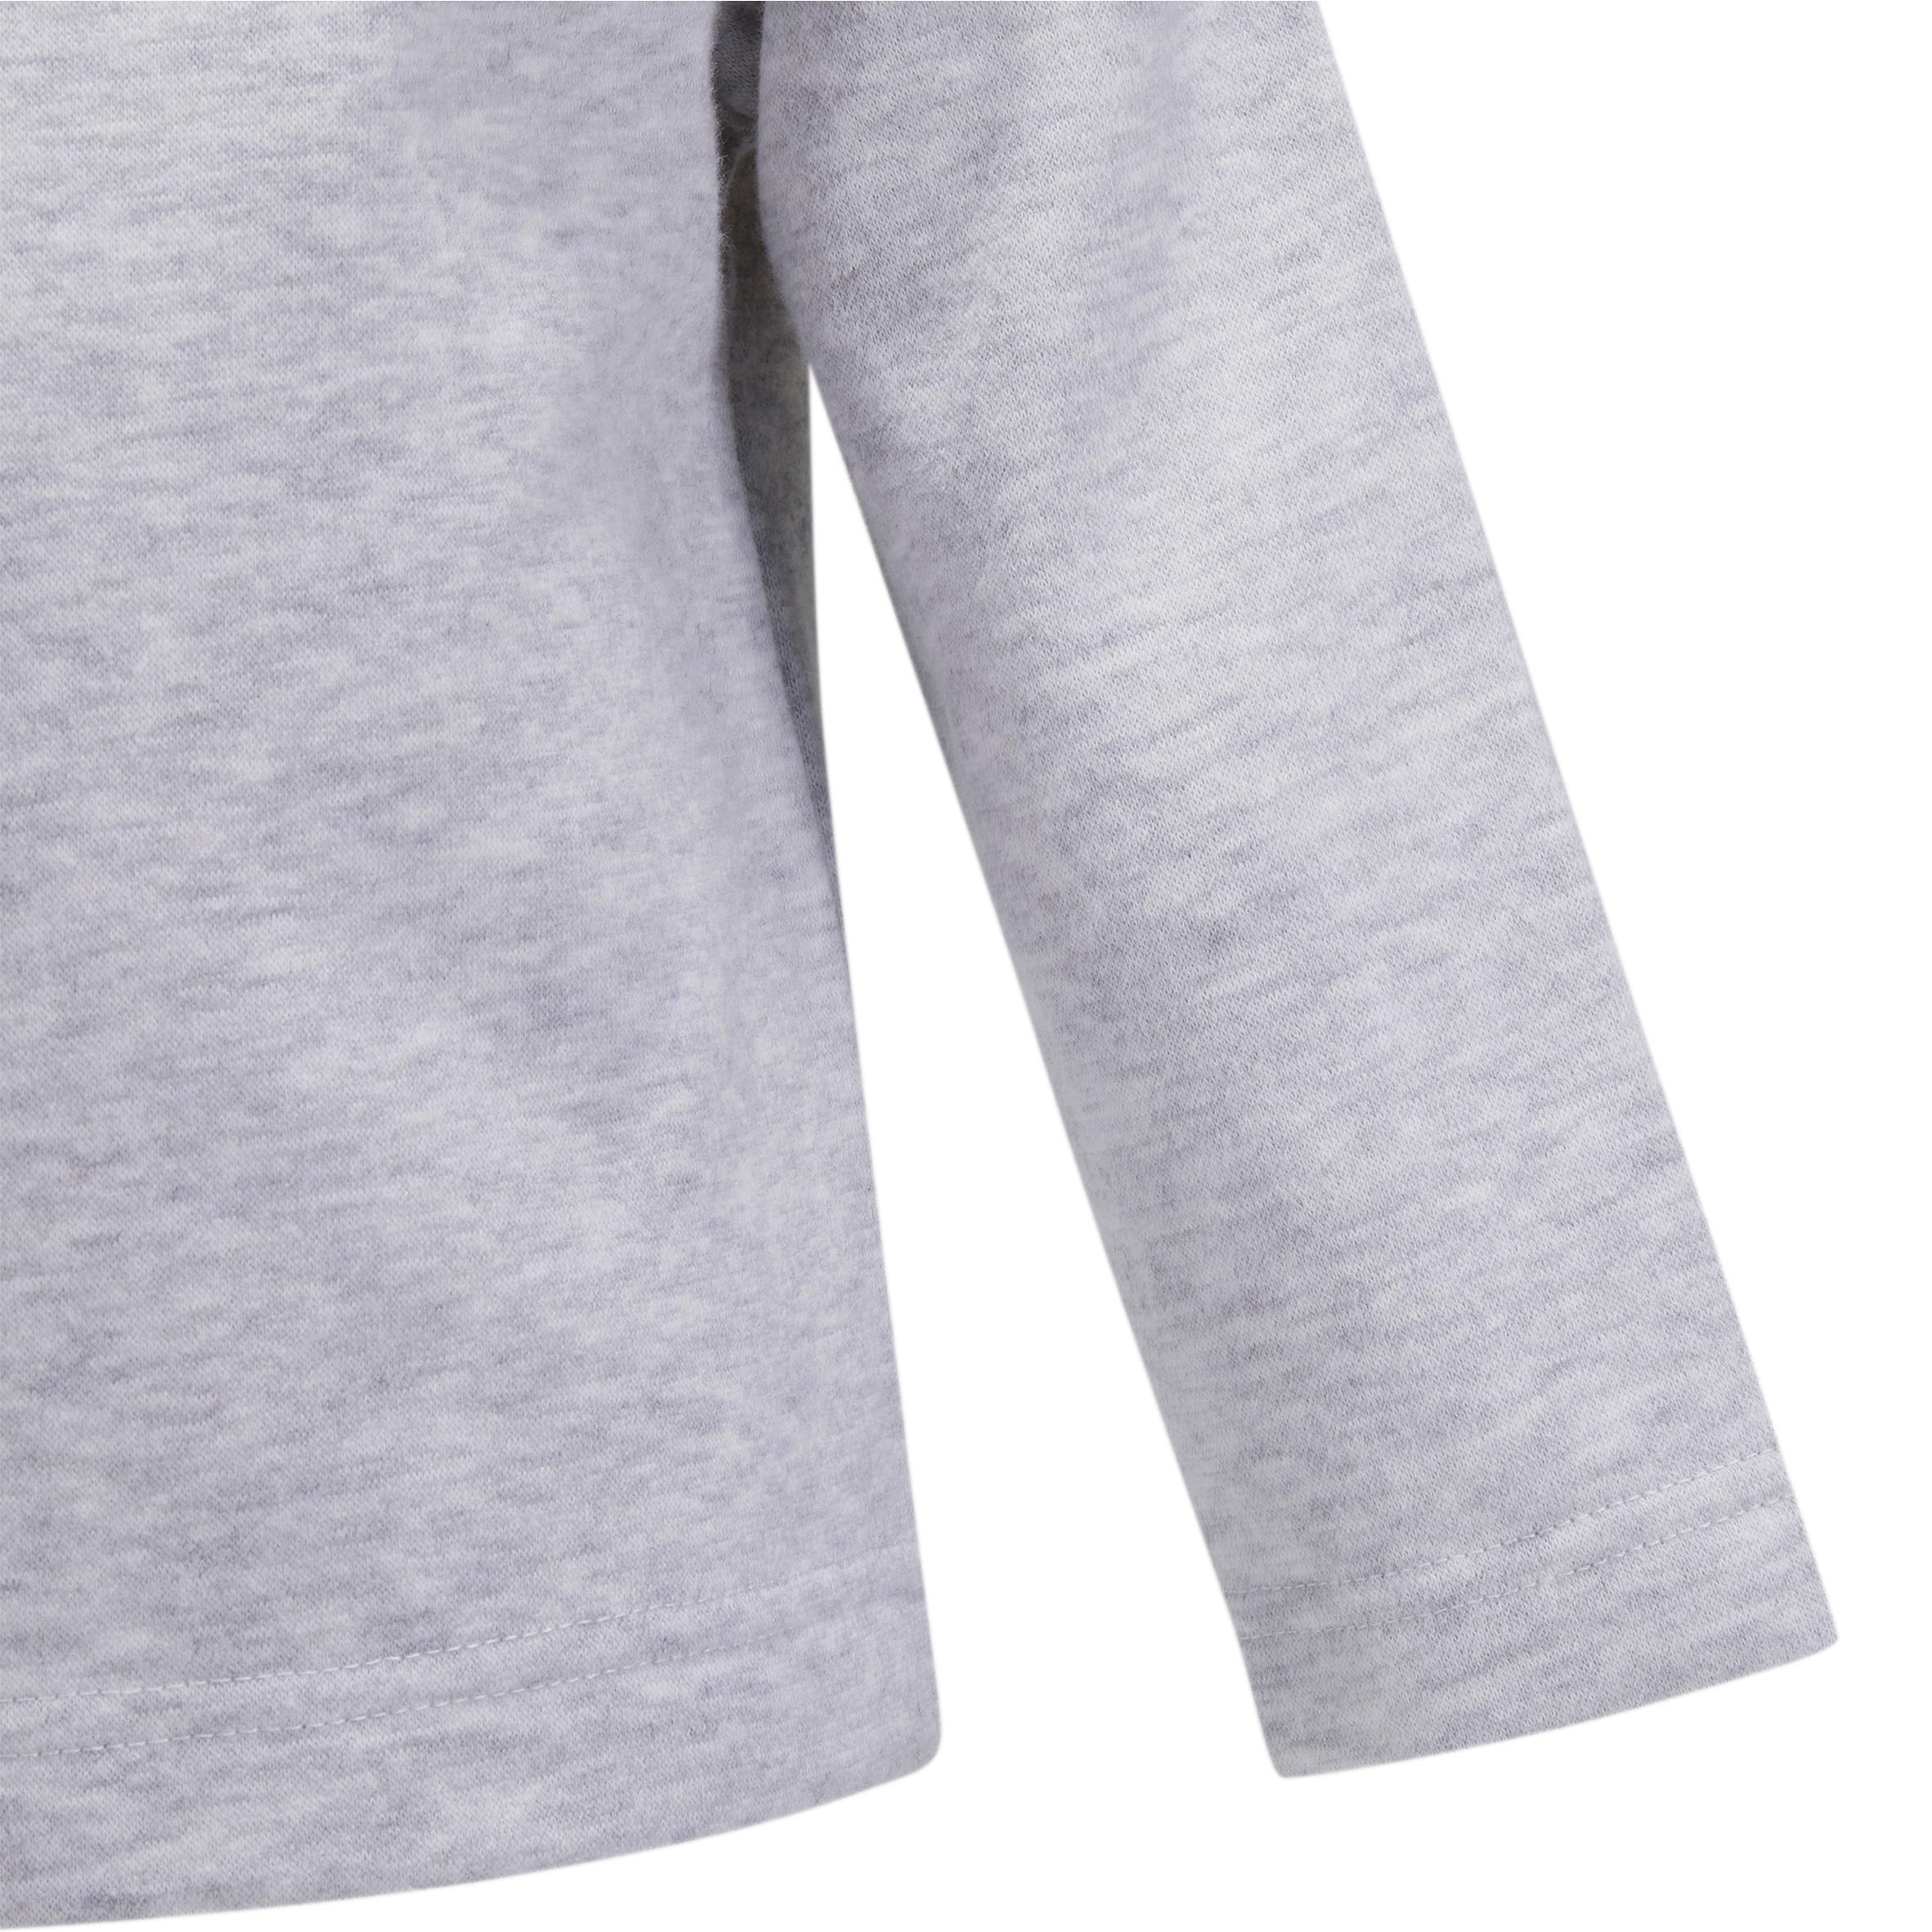 100 Baby Gym Sweatshirt - Grey Print